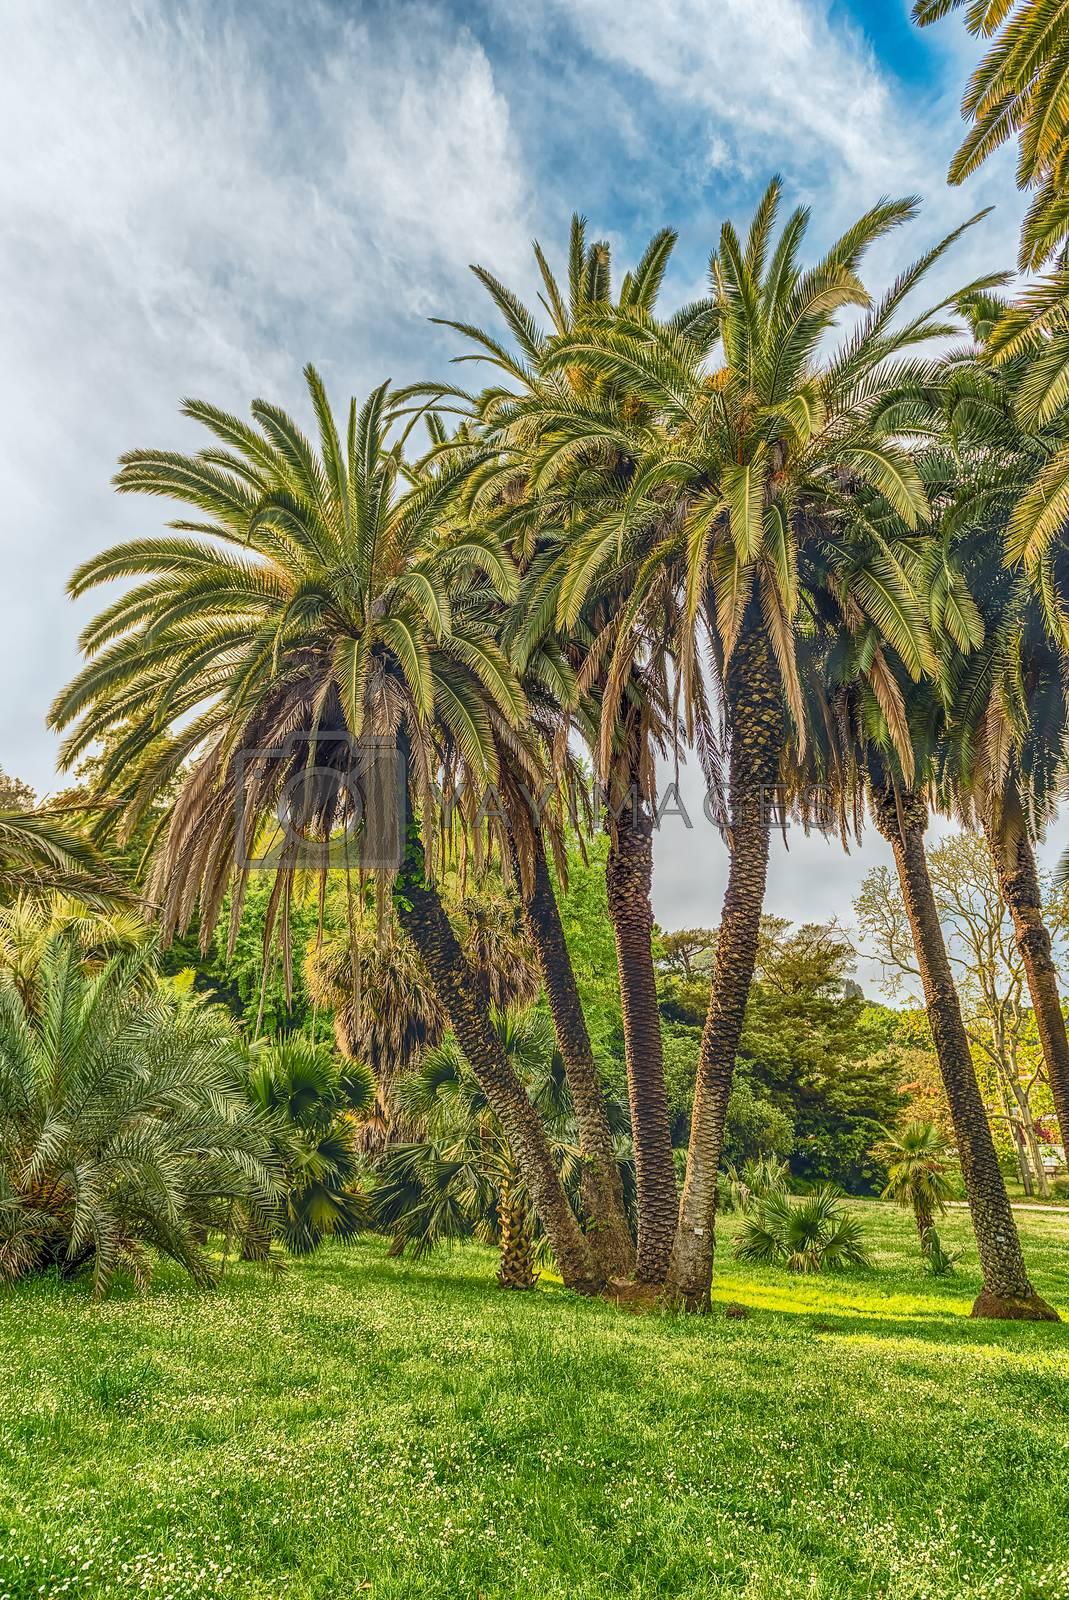 Beautiful palm trees inside a public garden in Rome, Italy